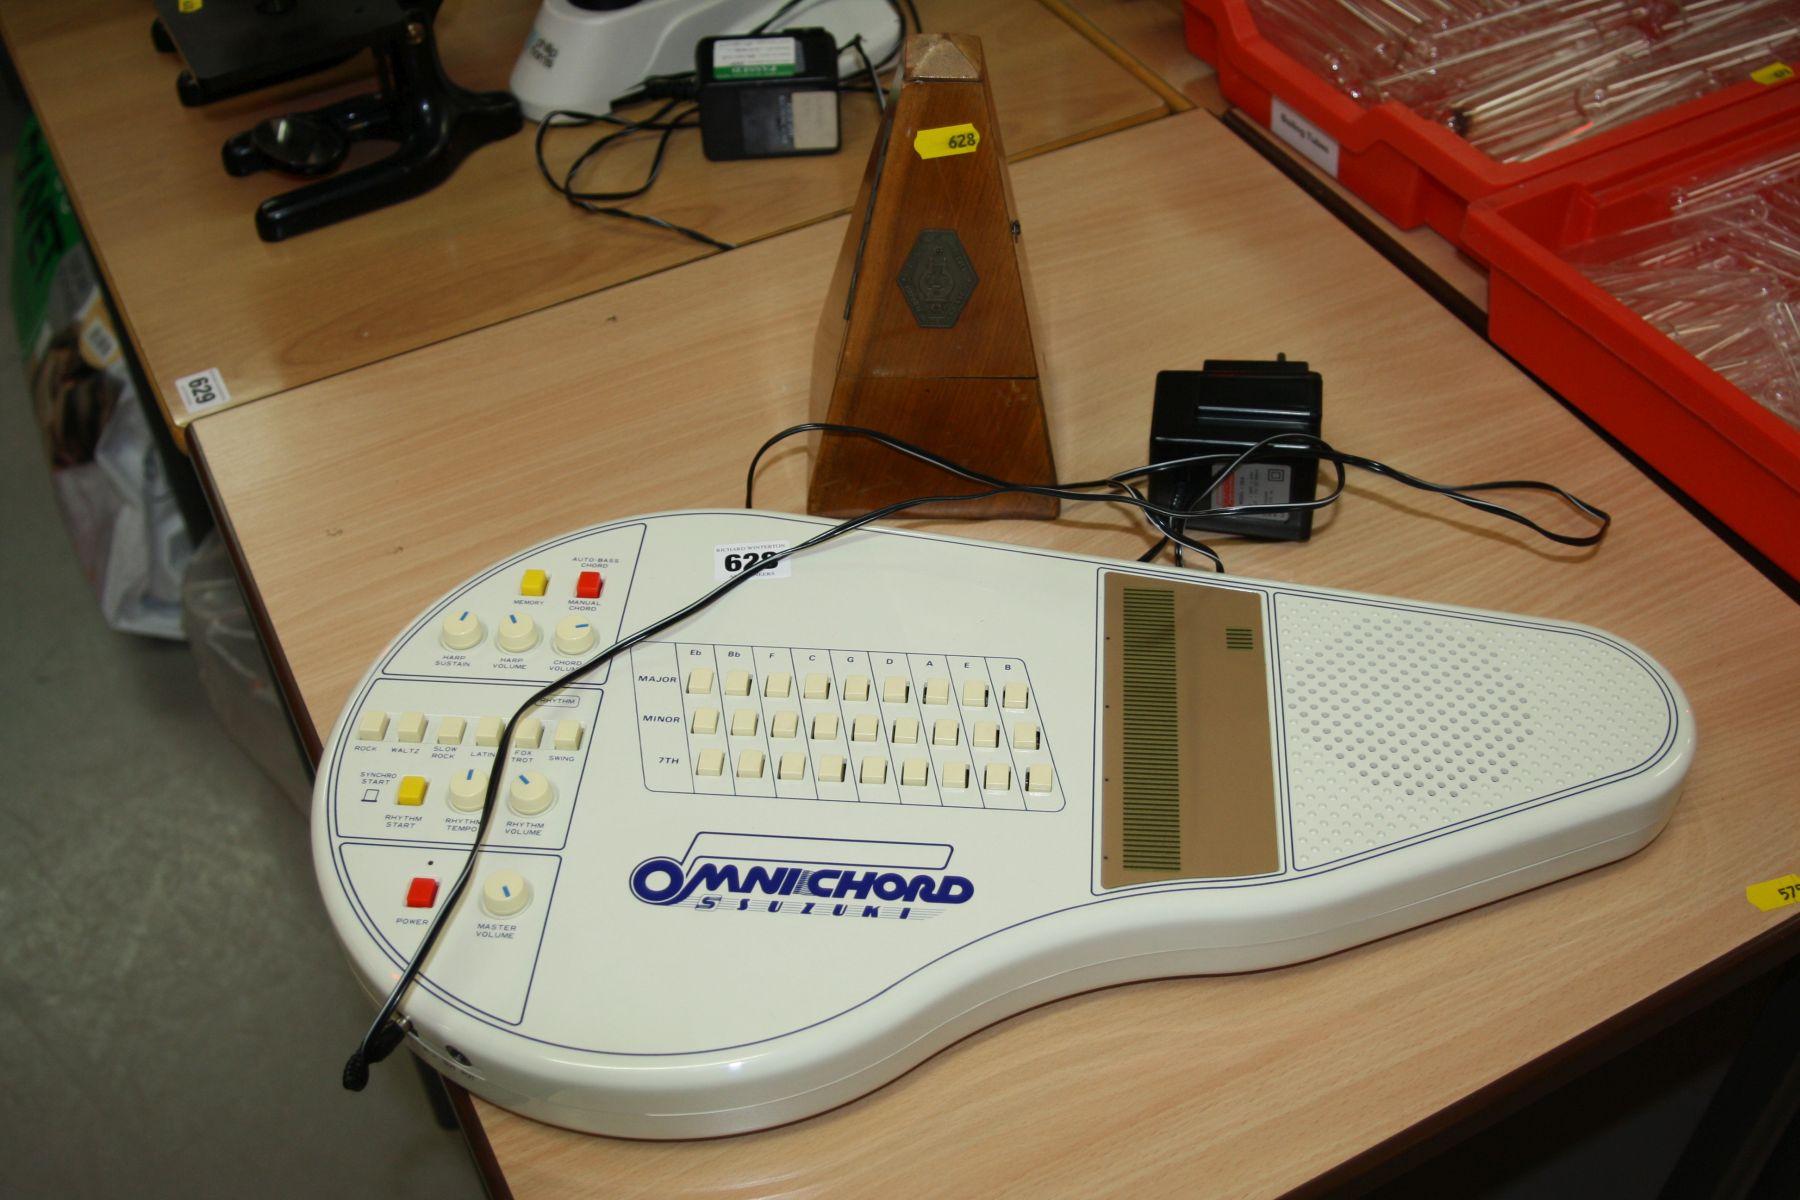 Lot 628 - A SUZUKI ELECTRONIC OMNI CHORD, with PSU and a clockwork metronome (no winder)